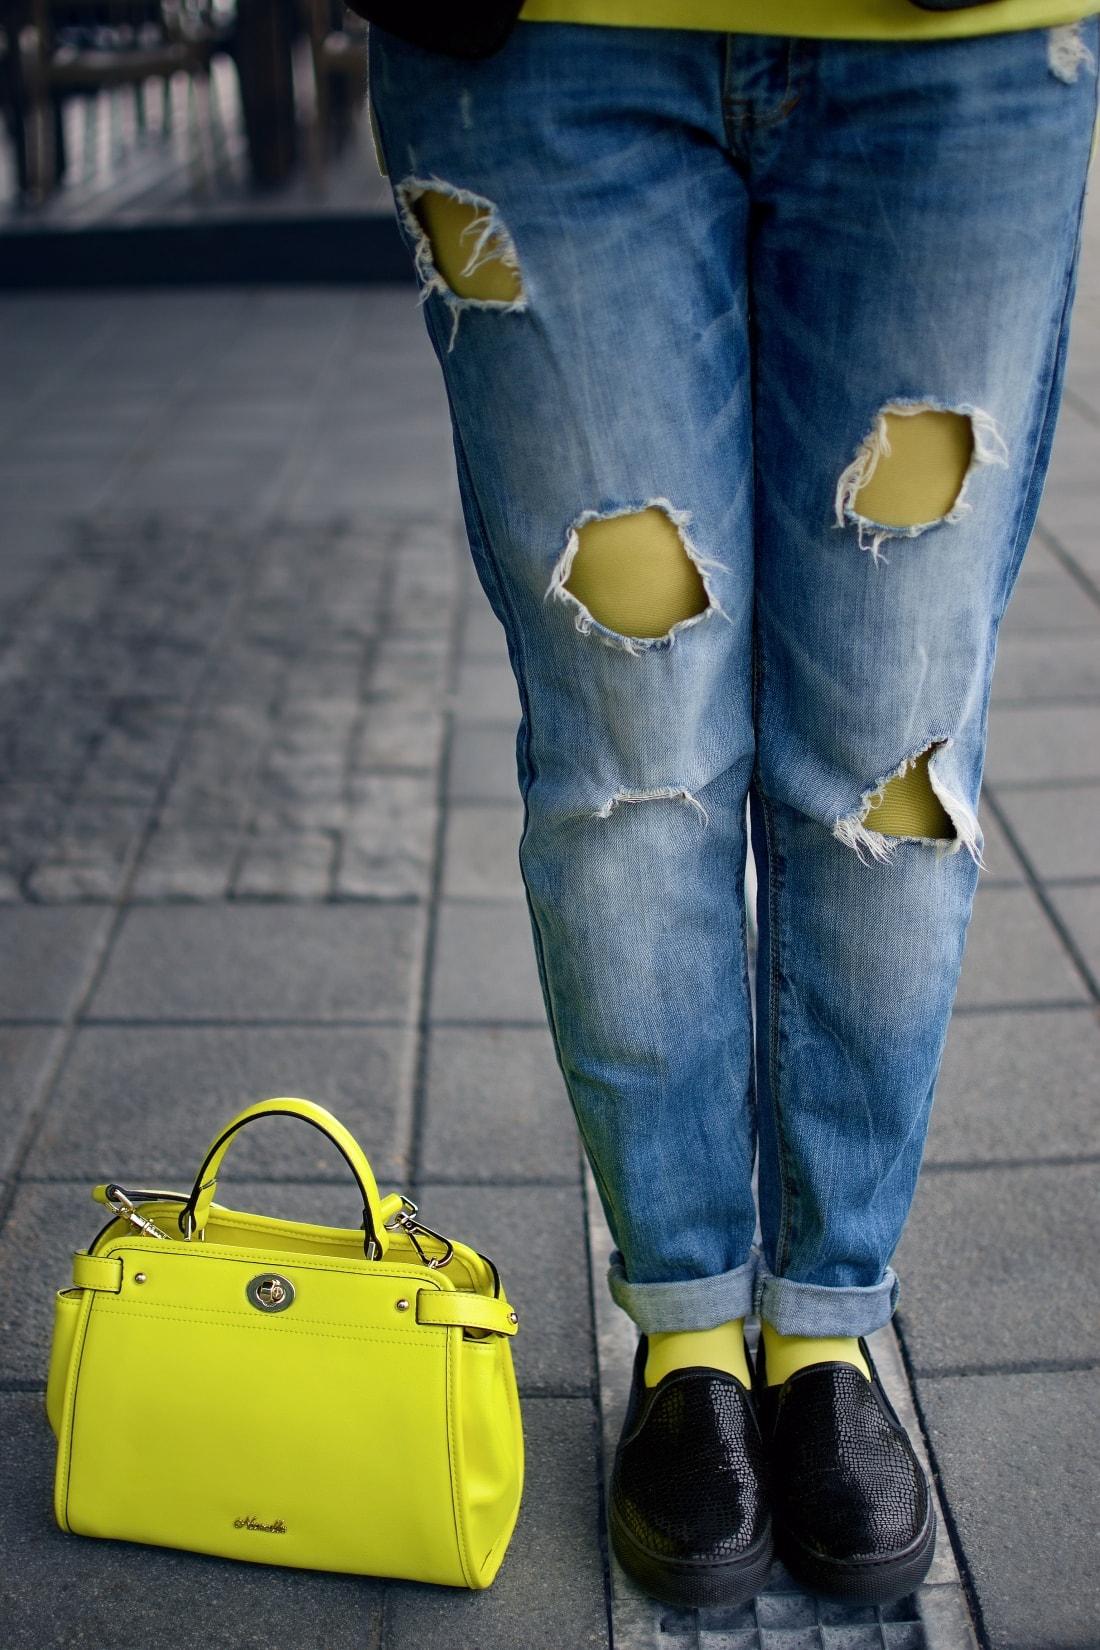 I LOVE COLOURED TIGHTS_Katharine-fashion is beautiful_blog 6_autumn look_Ripped jeans_Žltý sveter Zara_Žltá kabelka Nucelle_Čierne slipony Eobuv_Katarína Jakubčová_Fashion blogger